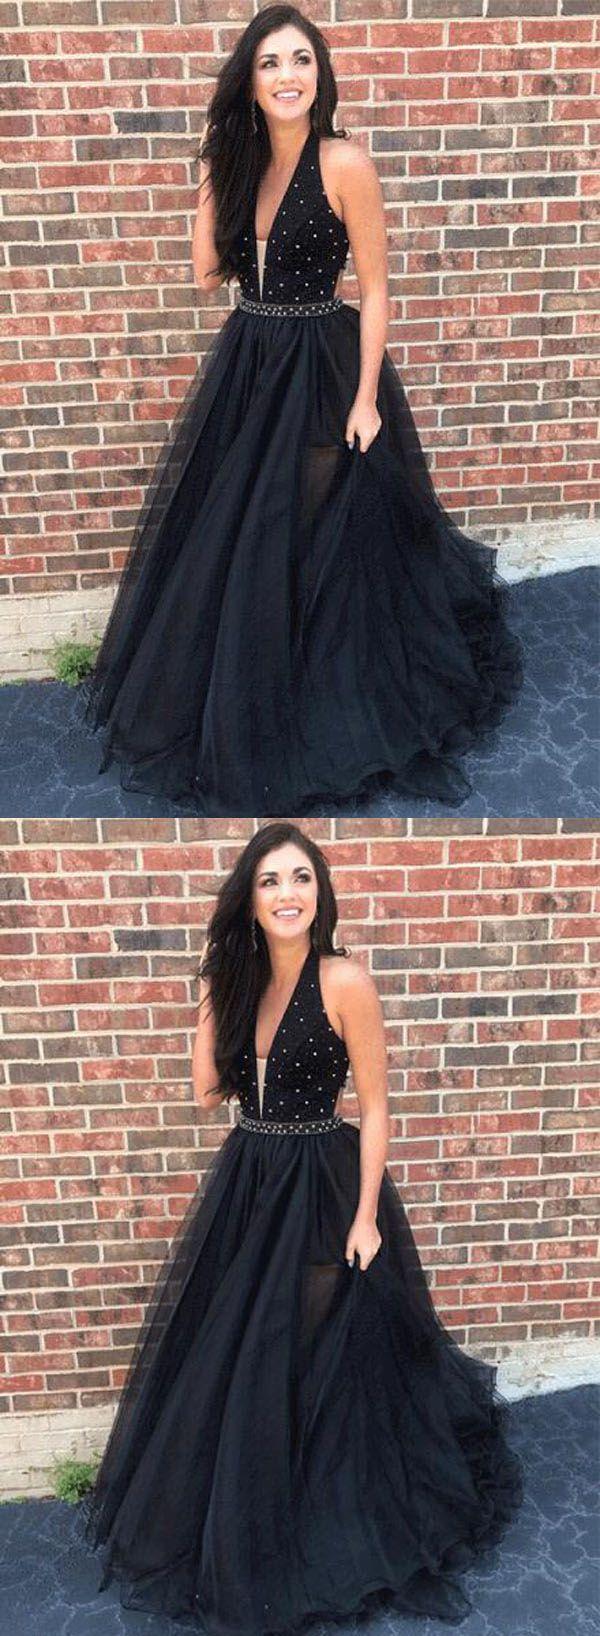 Aline black long promevening dress promdresses blackpromdresses